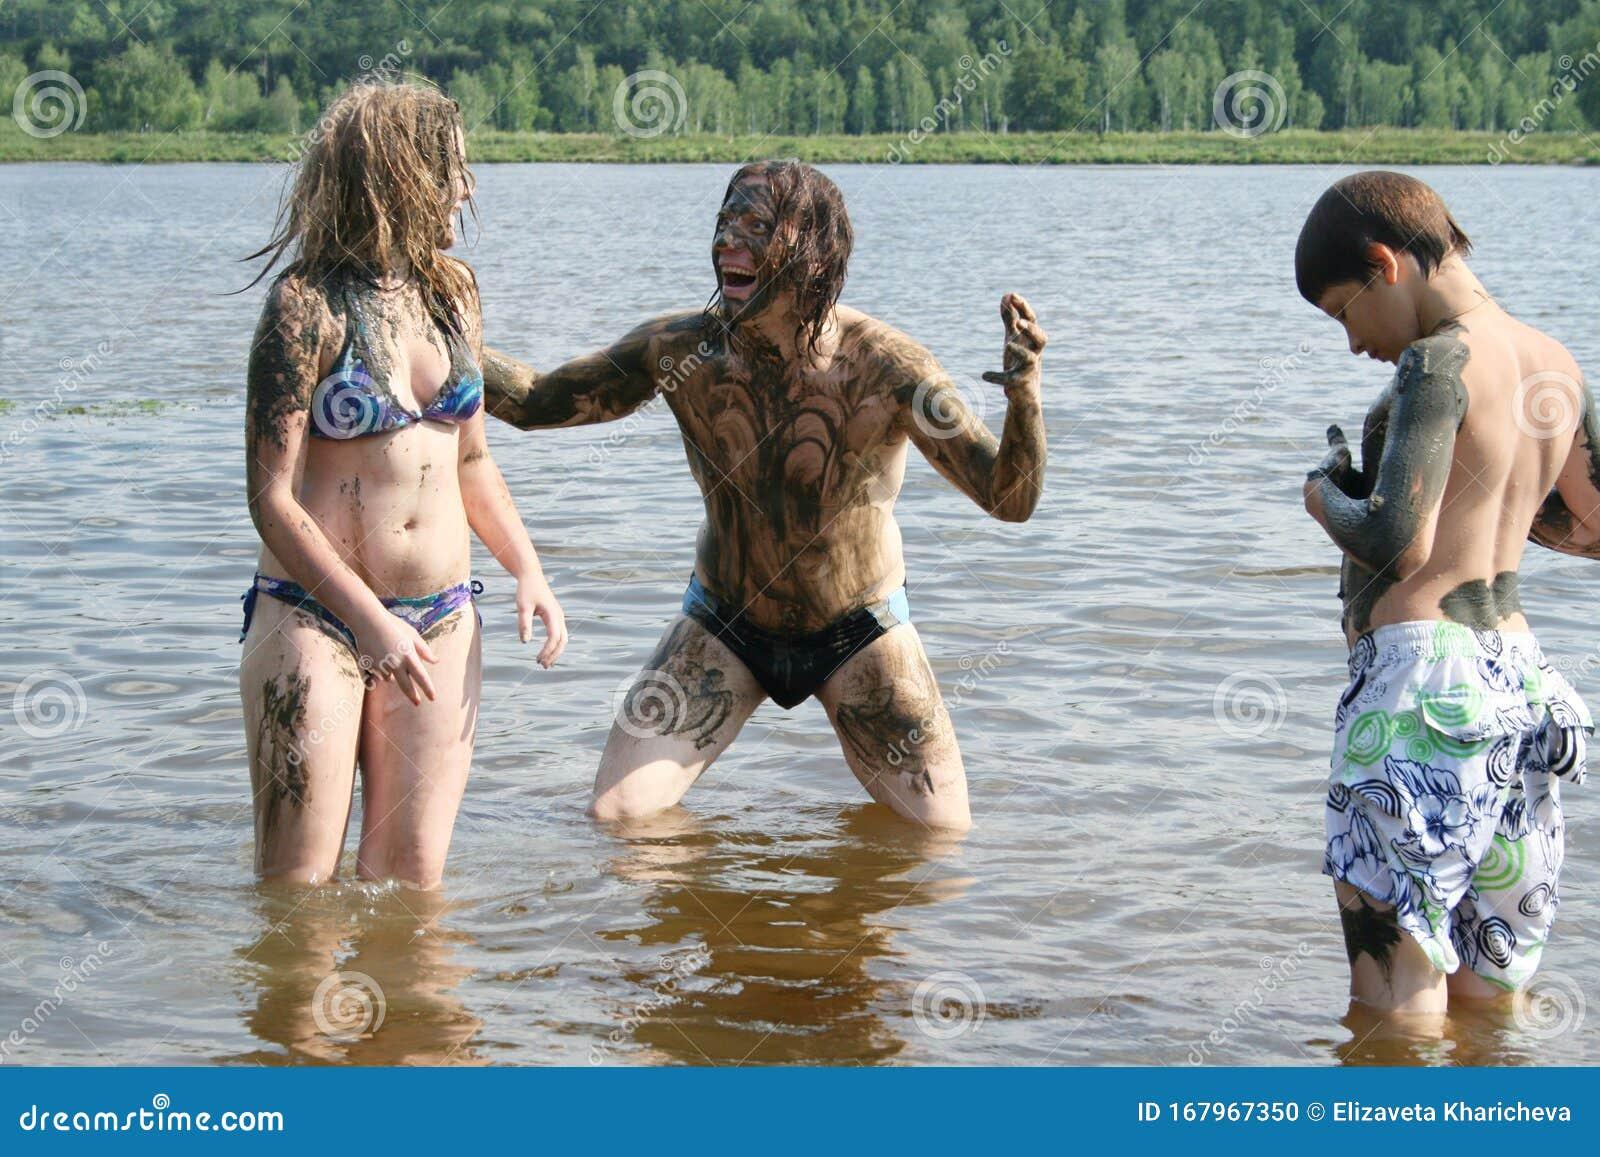 Naked families photos